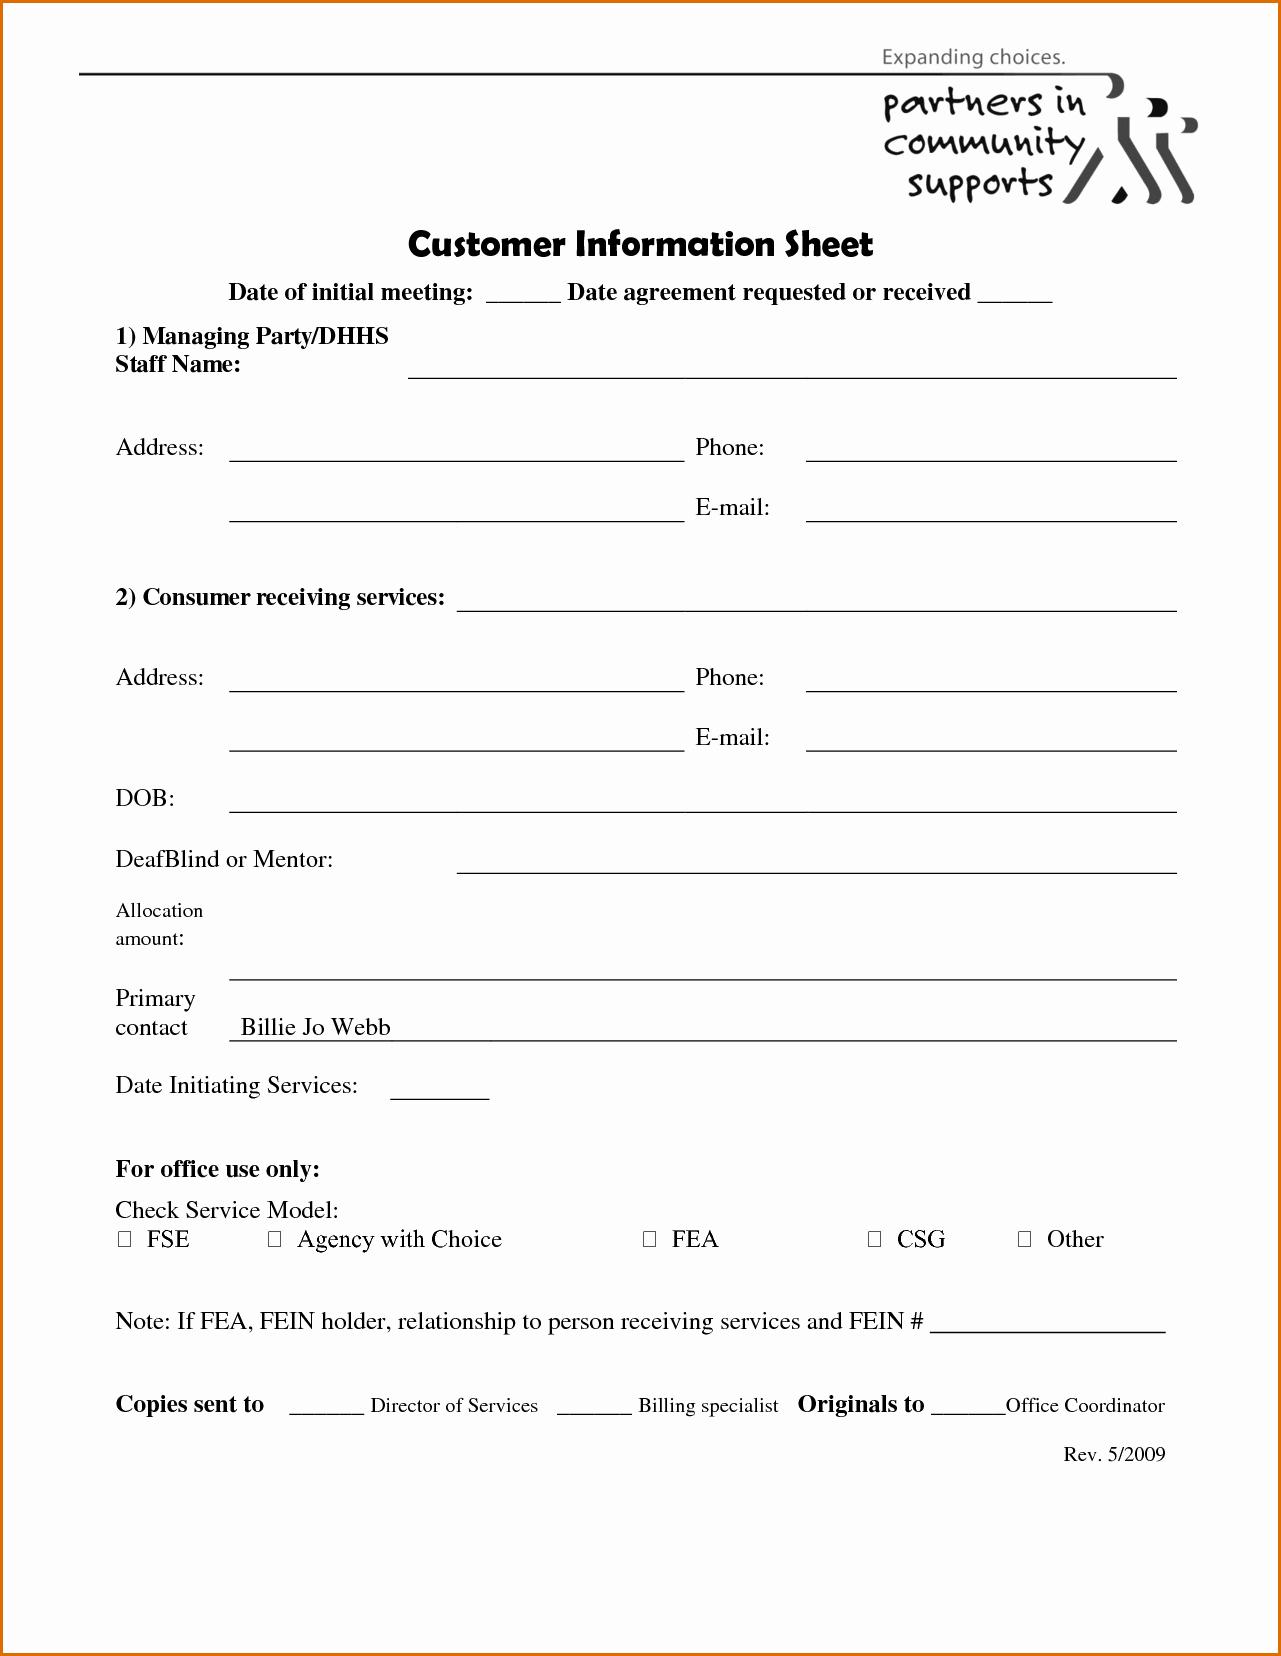 Customer Information Sheet Template Beautiful 10 Client Information Sheet Template